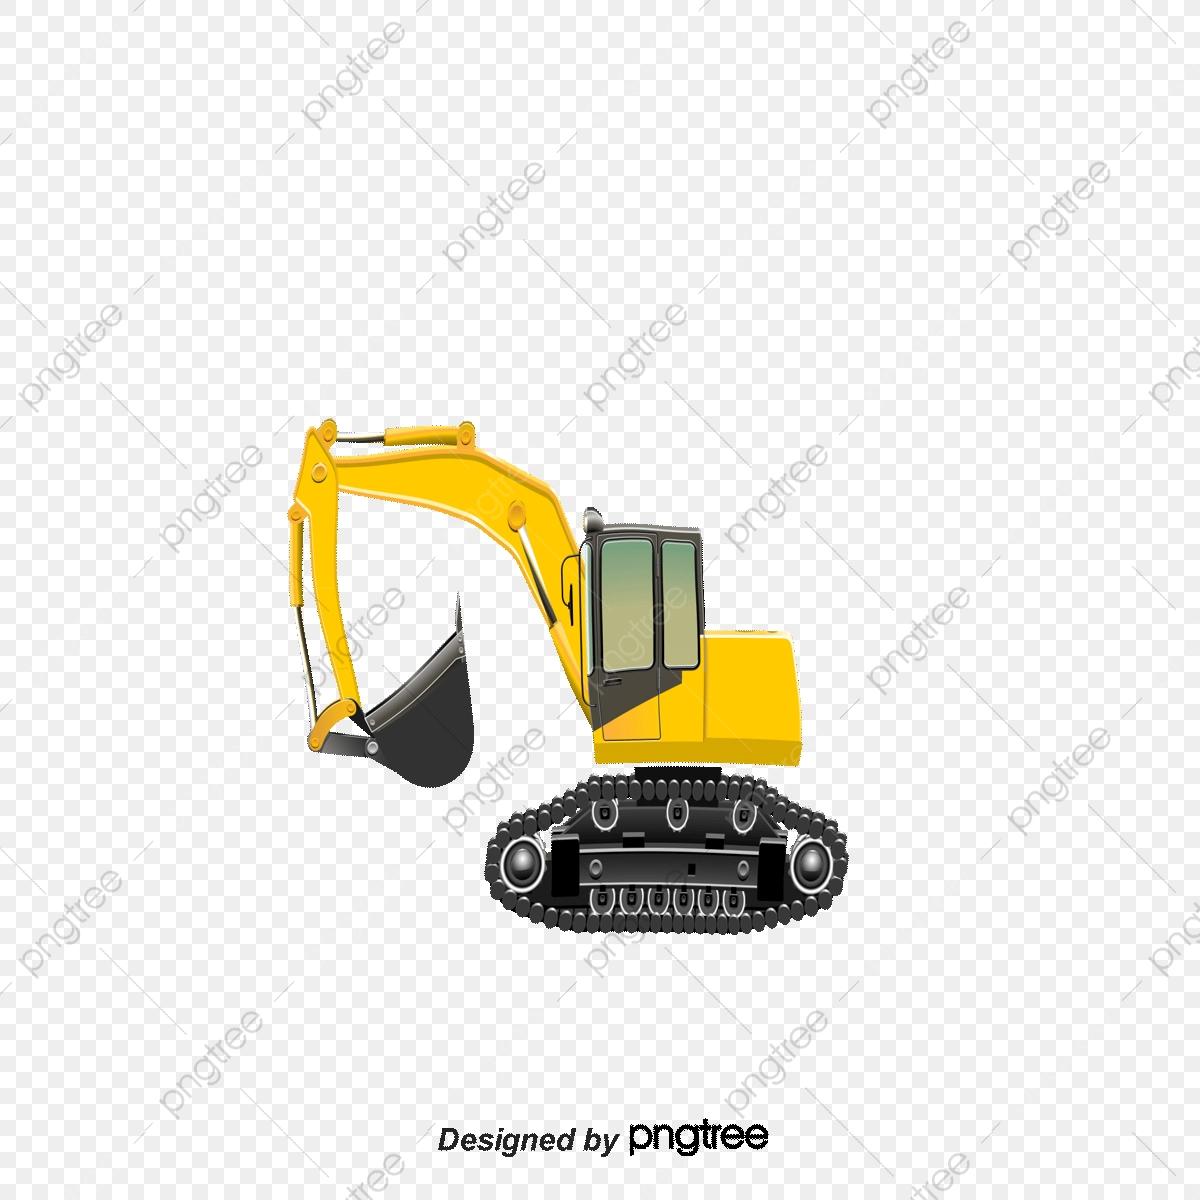 Design elements of yellow. Excavator clipart cartoon